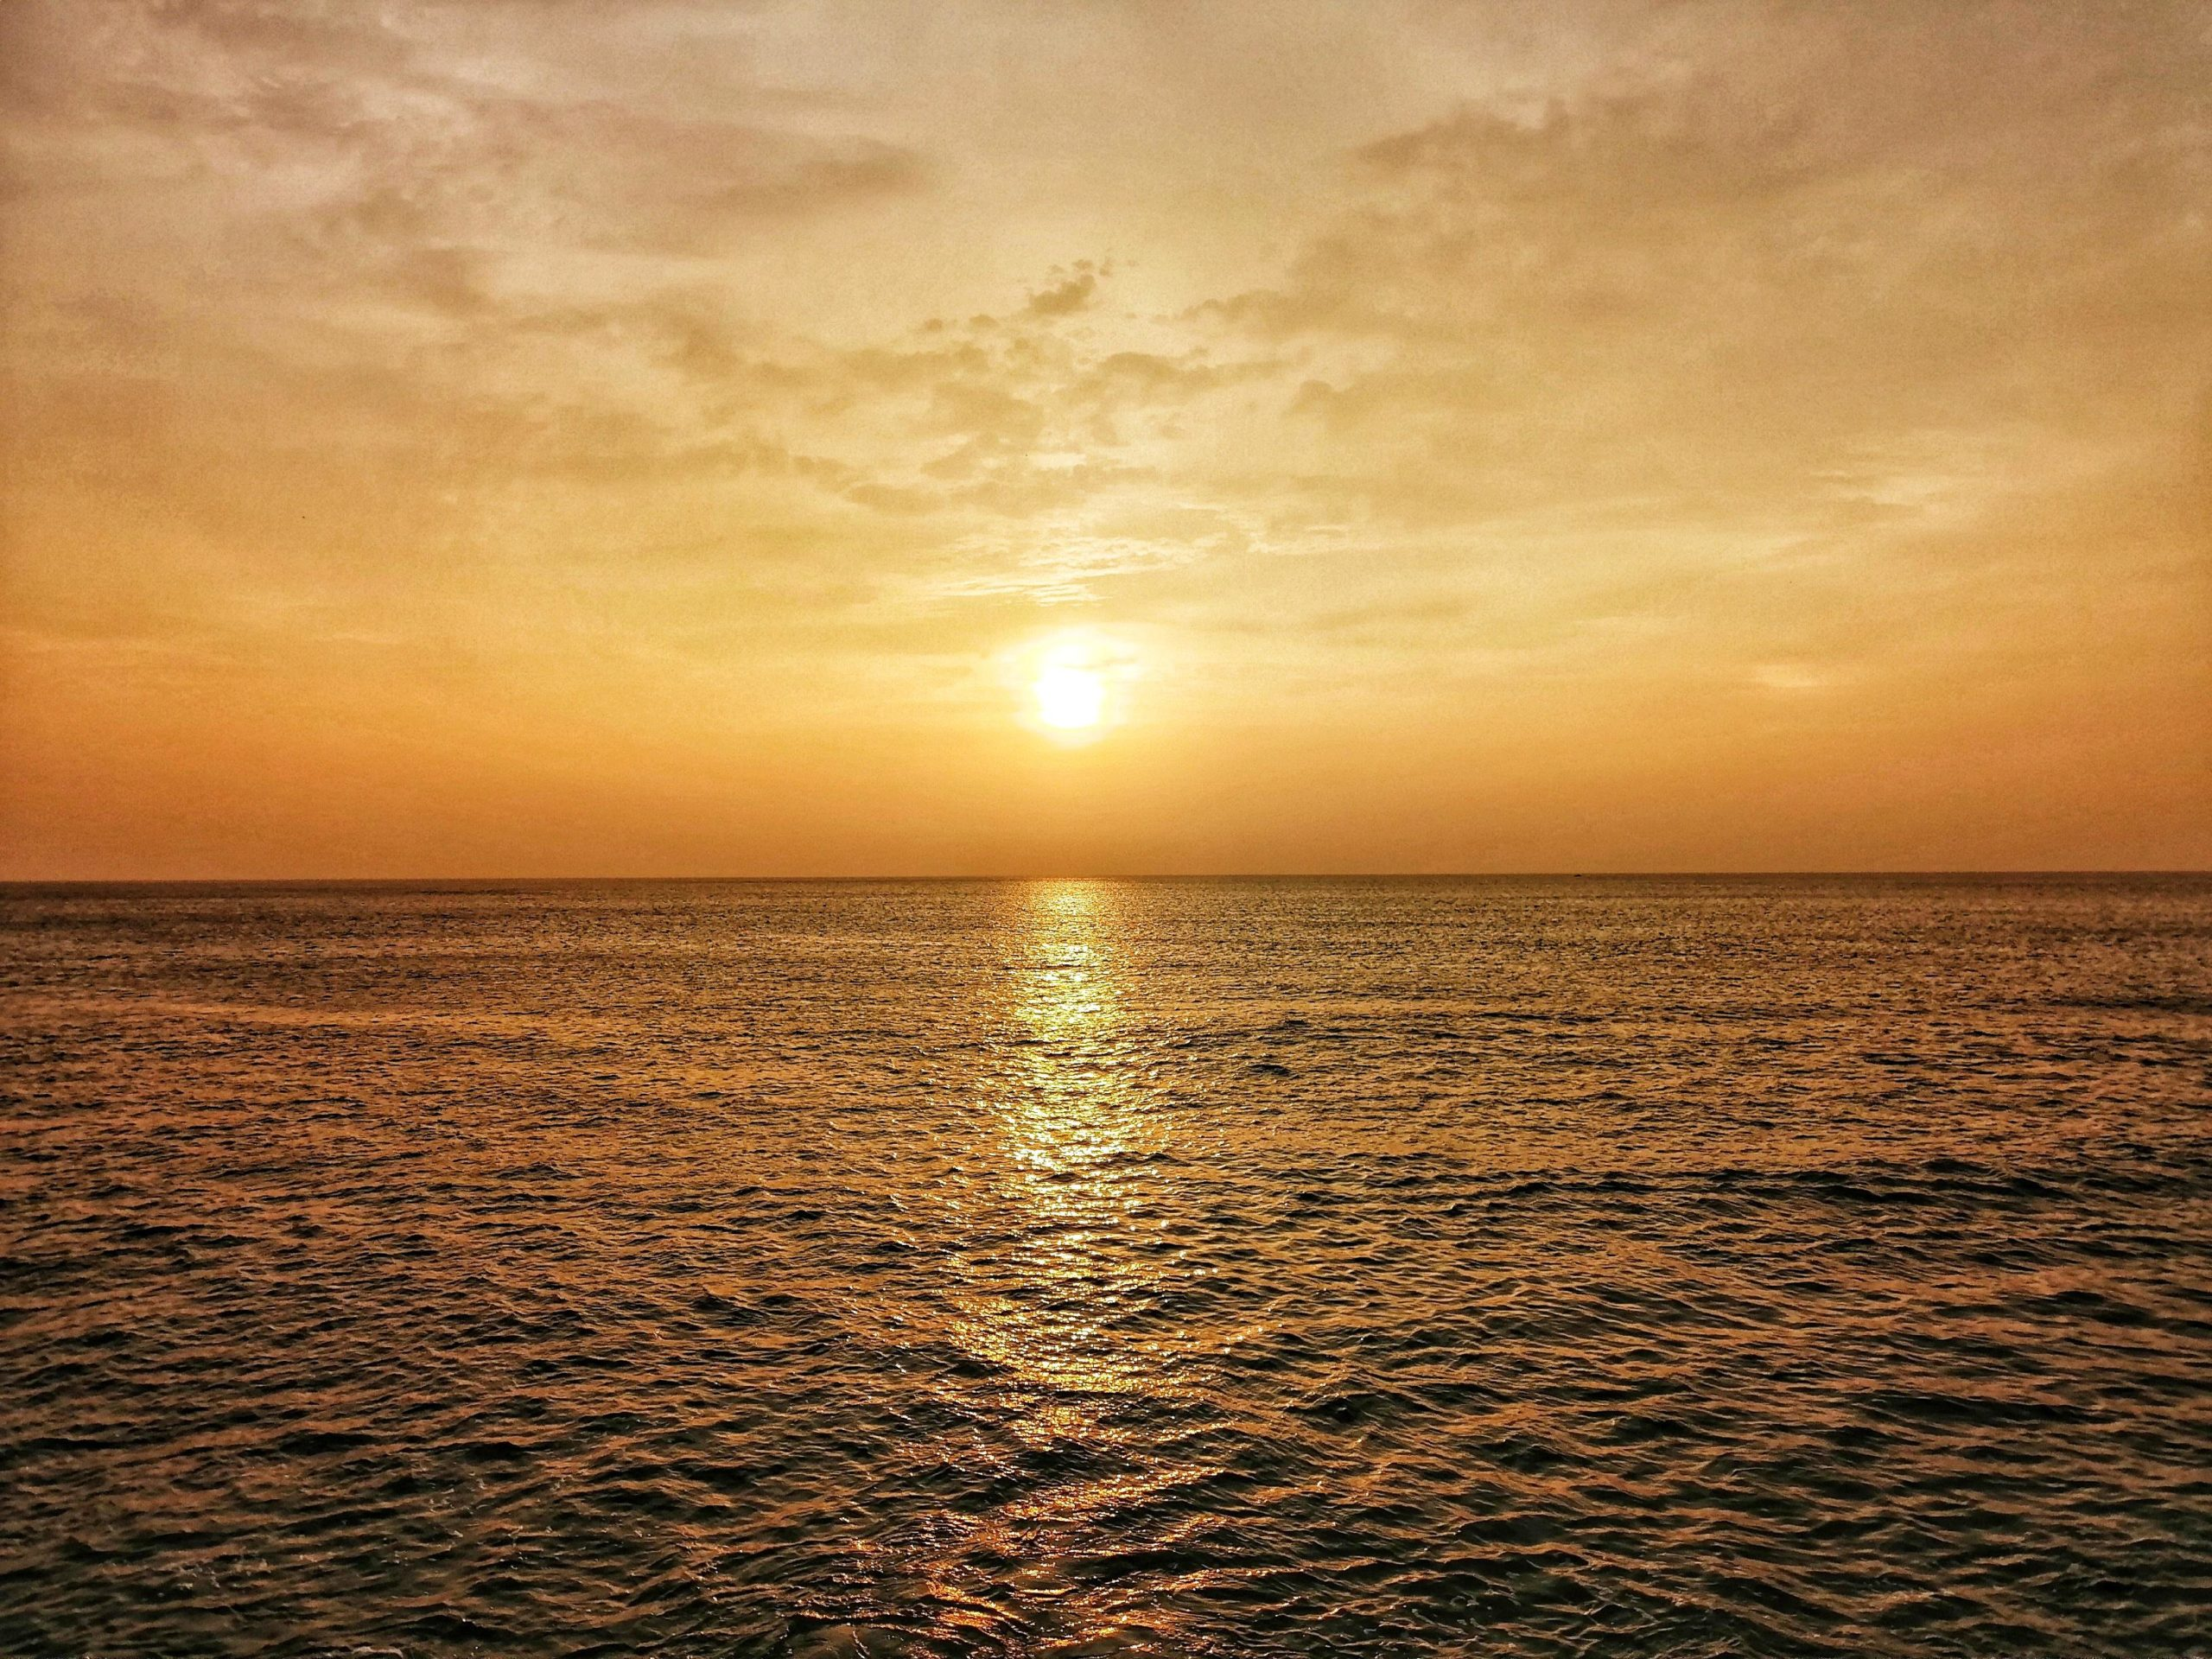 Does anyone like minimalist pics? (sri lanka - sunset) OC